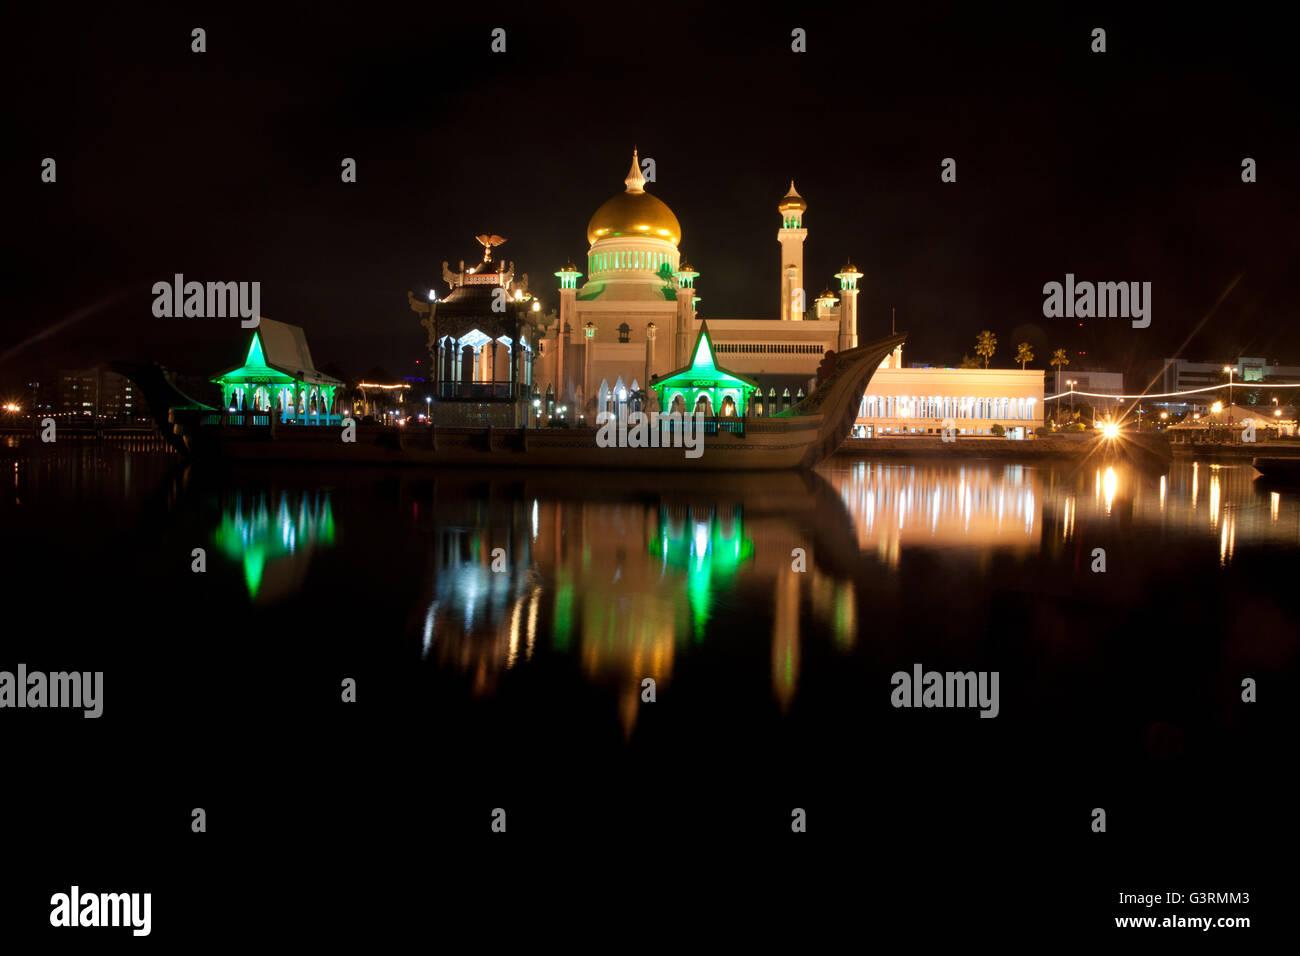 Beautiful Mosque at night - Stock Image